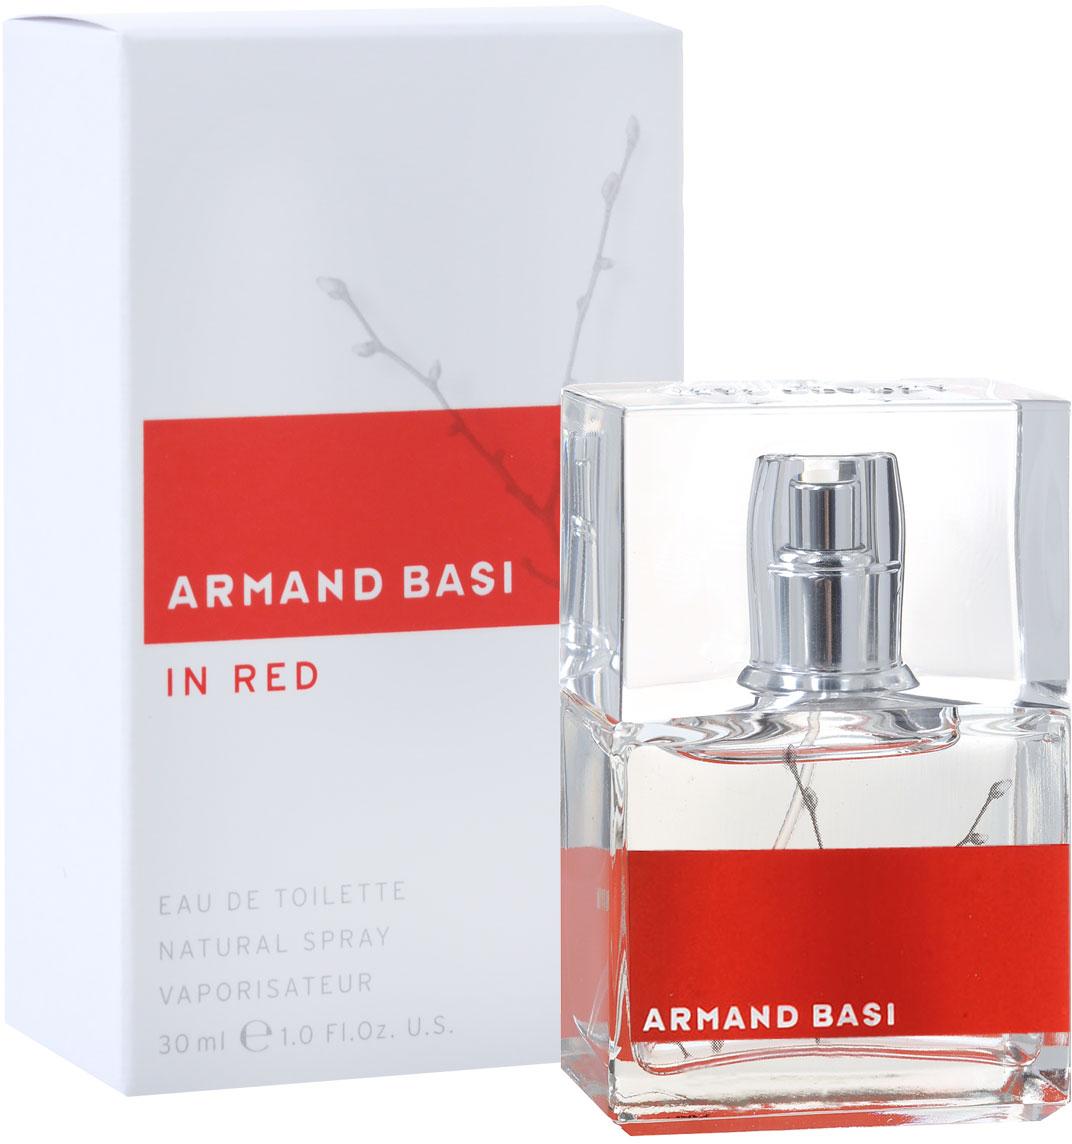 Armand Basi Туалетная вода In Red, женская, 30 мл туалетная вода armand basi basi in red 50 мл